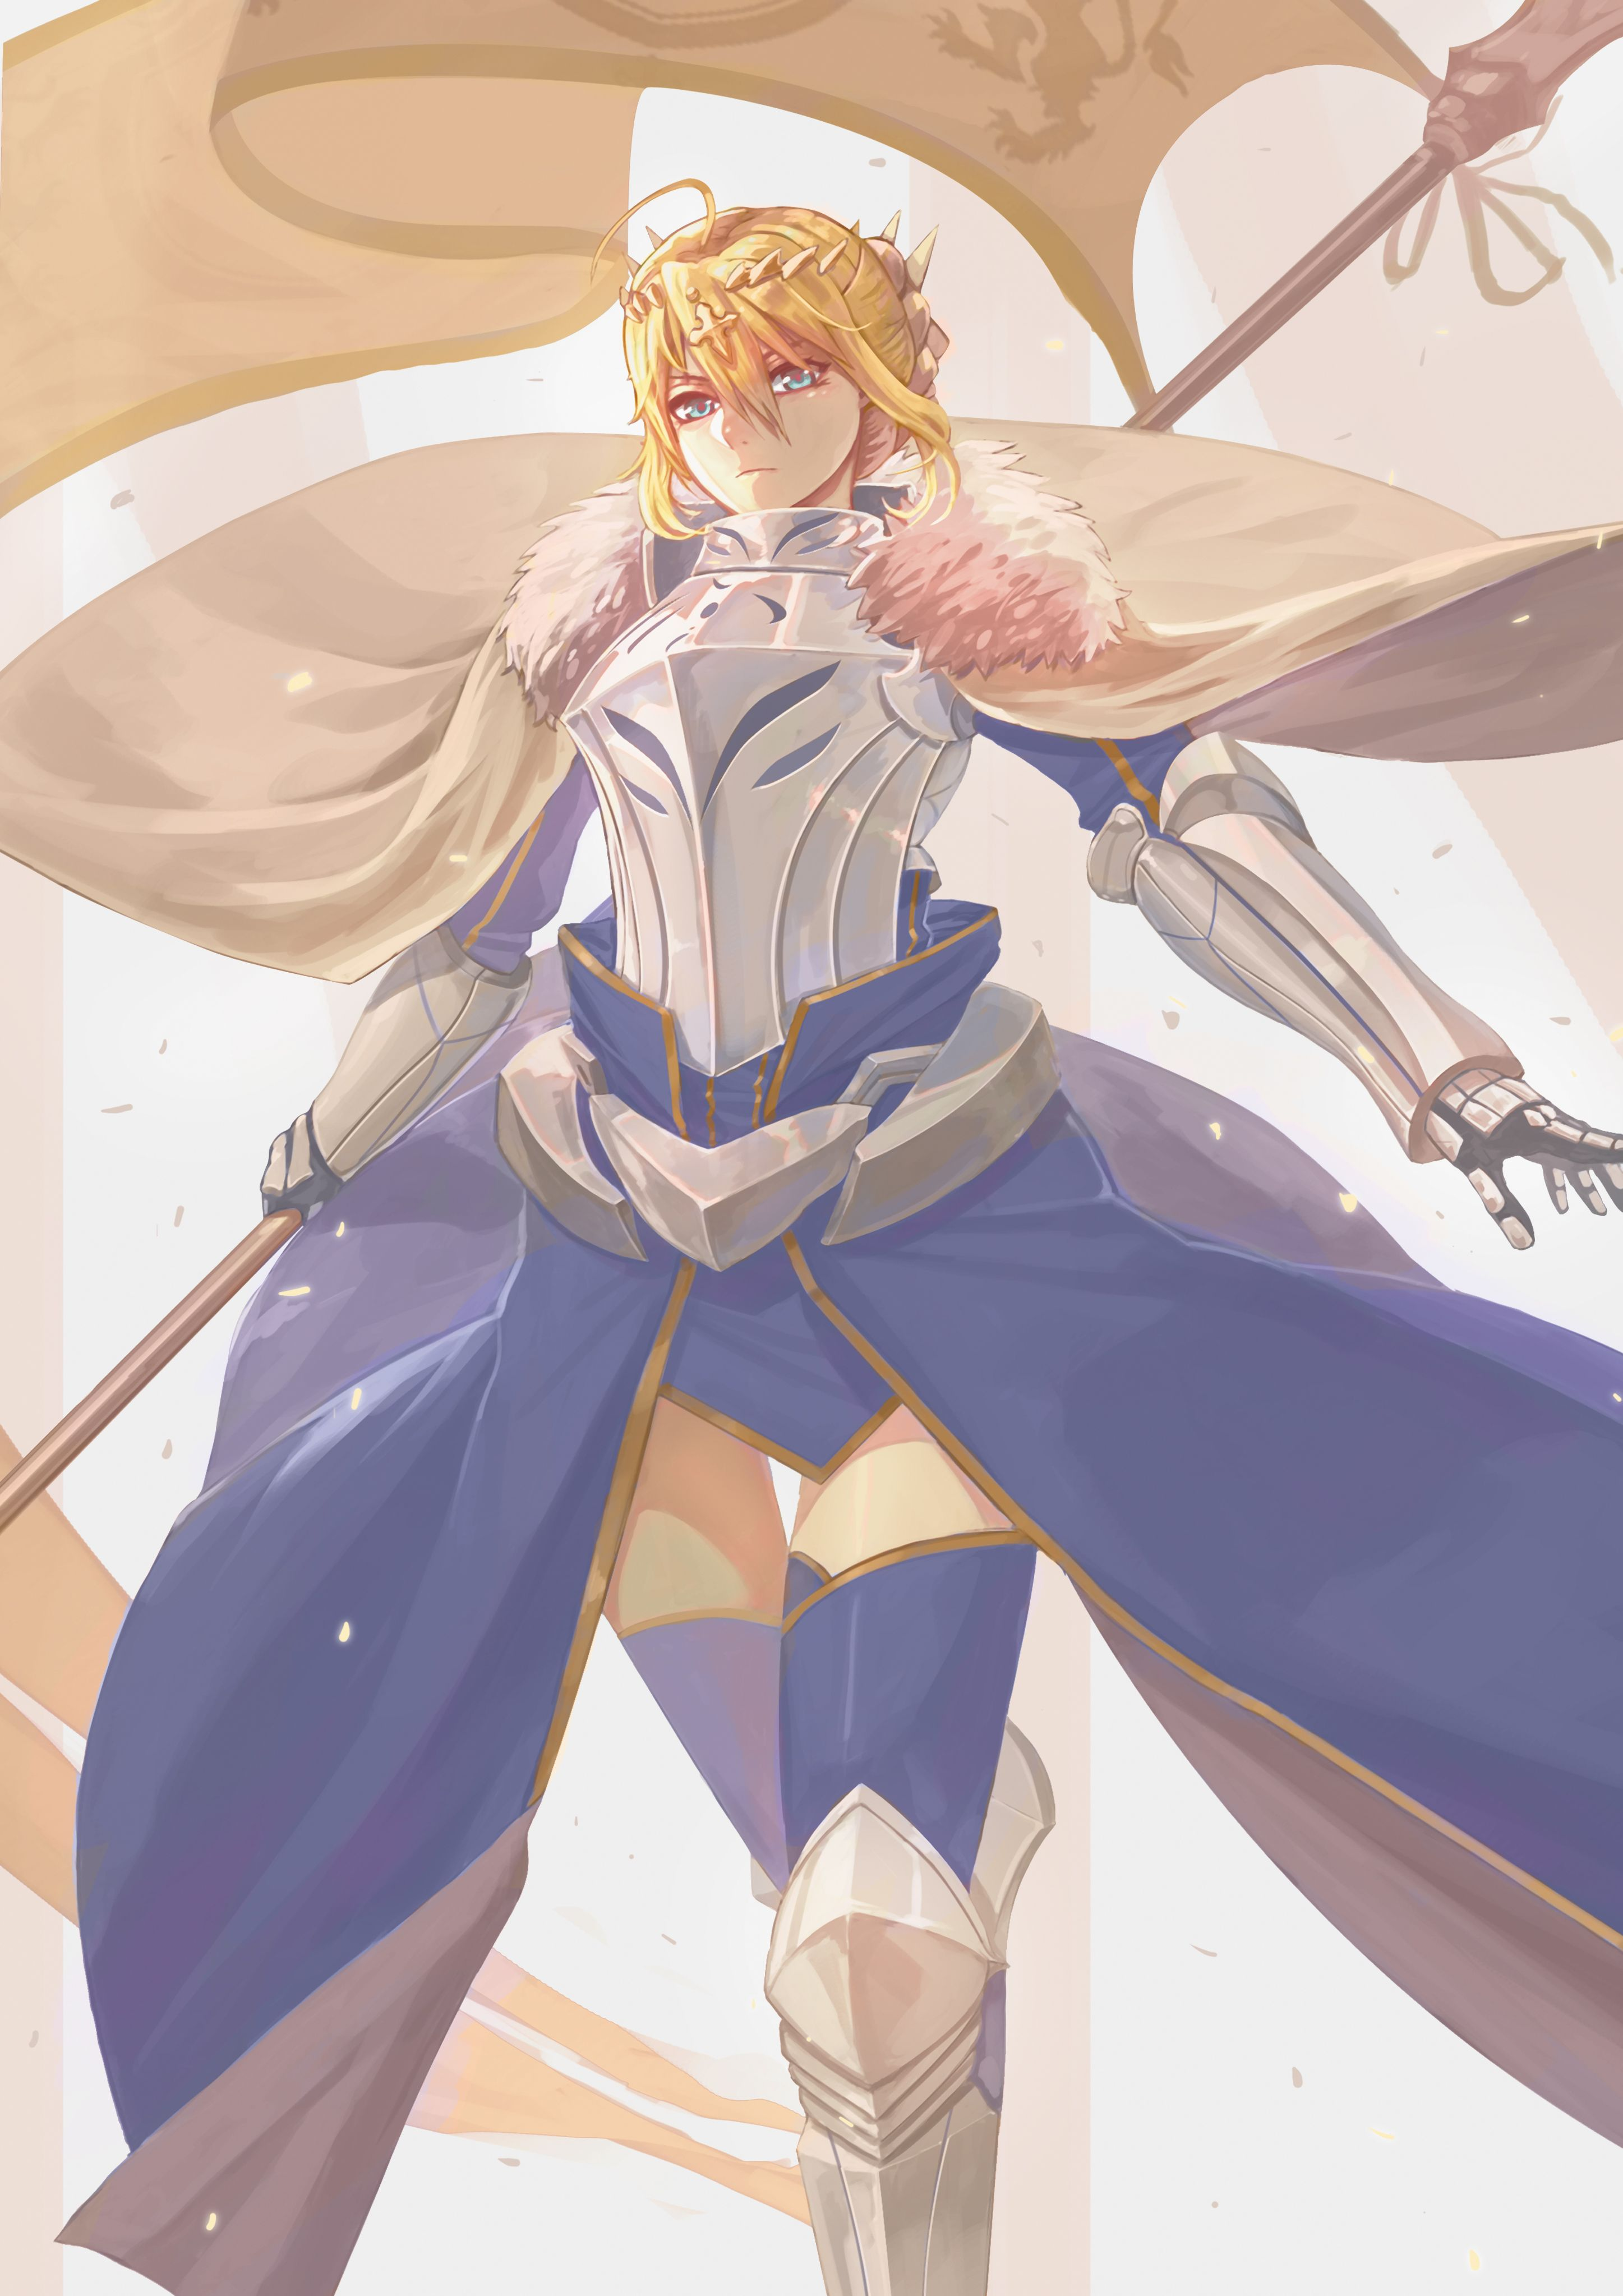 Pinterest | Fate stay night, Fate stay night series, Female knight